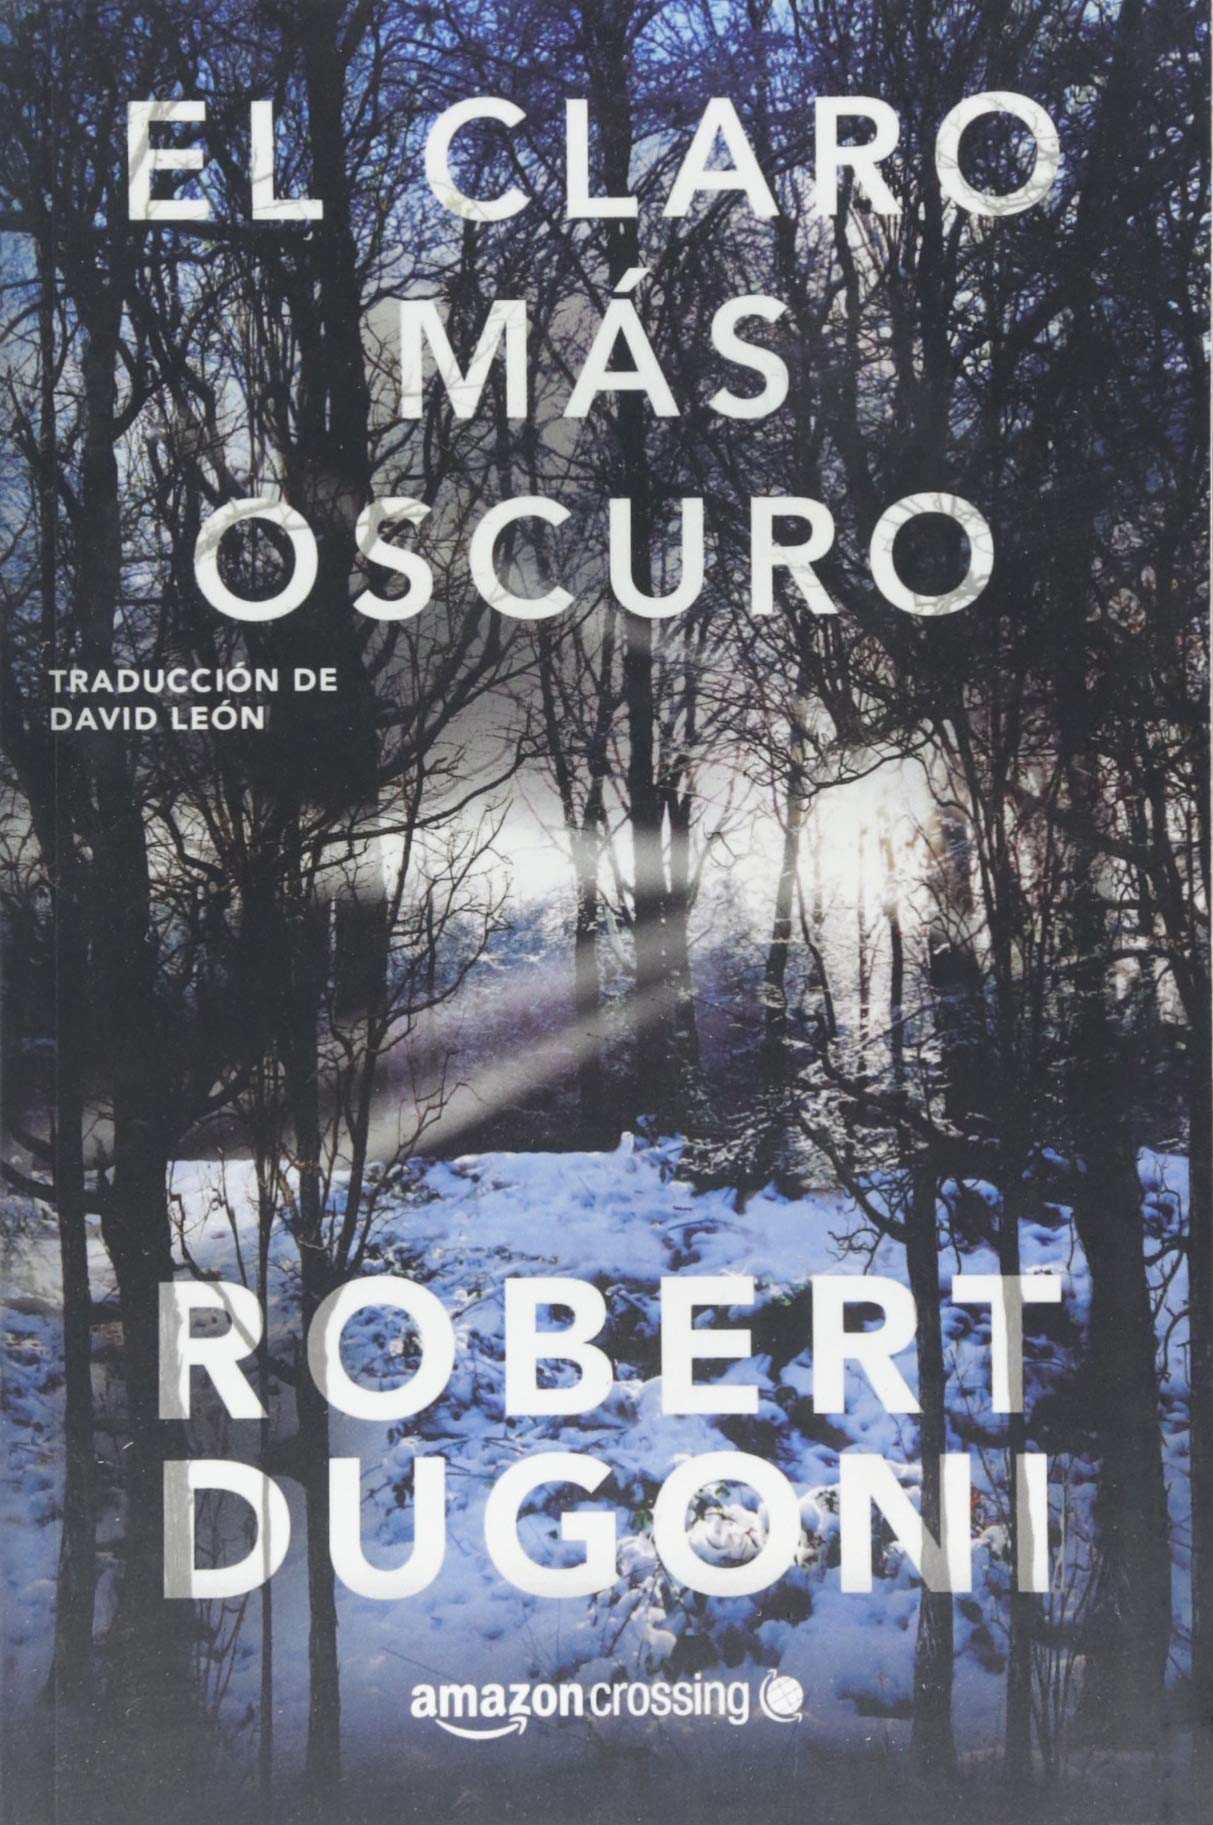 Amazon.com: El claro más oscuro (Tracy Crosswhite) (Spanish Edition)  (9782919800988): Robert Dugoni, David León: Books